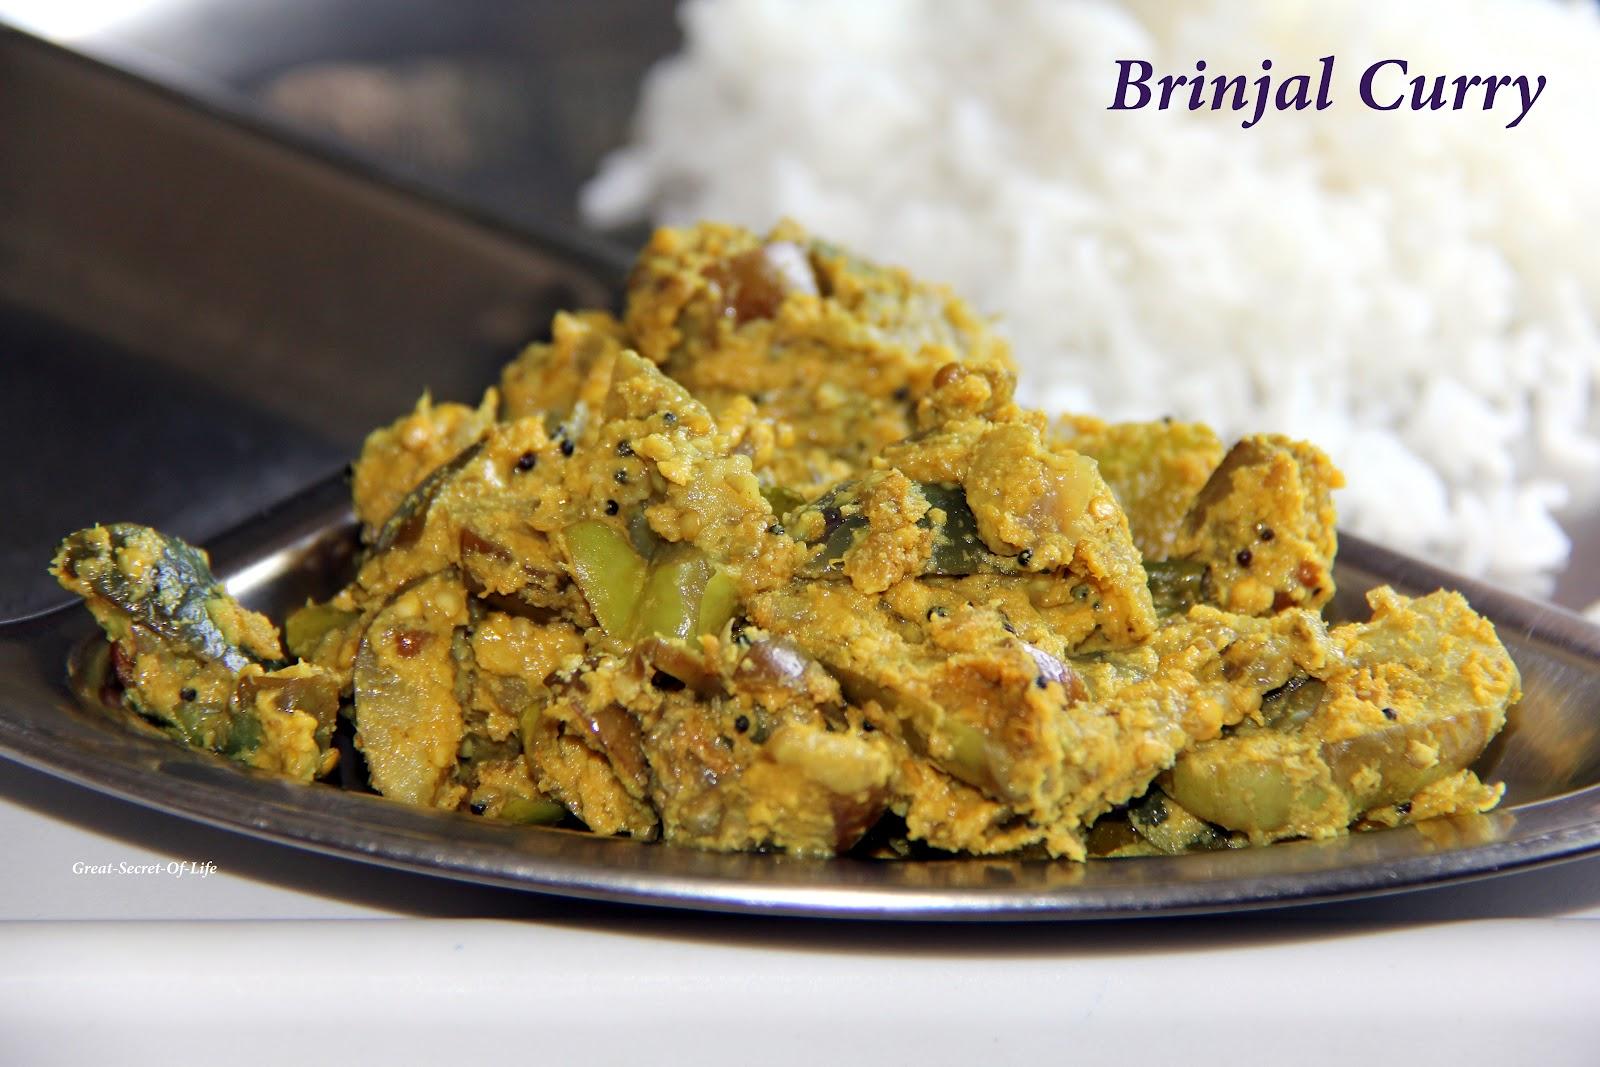 Brinjal / Eggplant Curry| Great-secret-of-life  Brinjal / Eggpl...